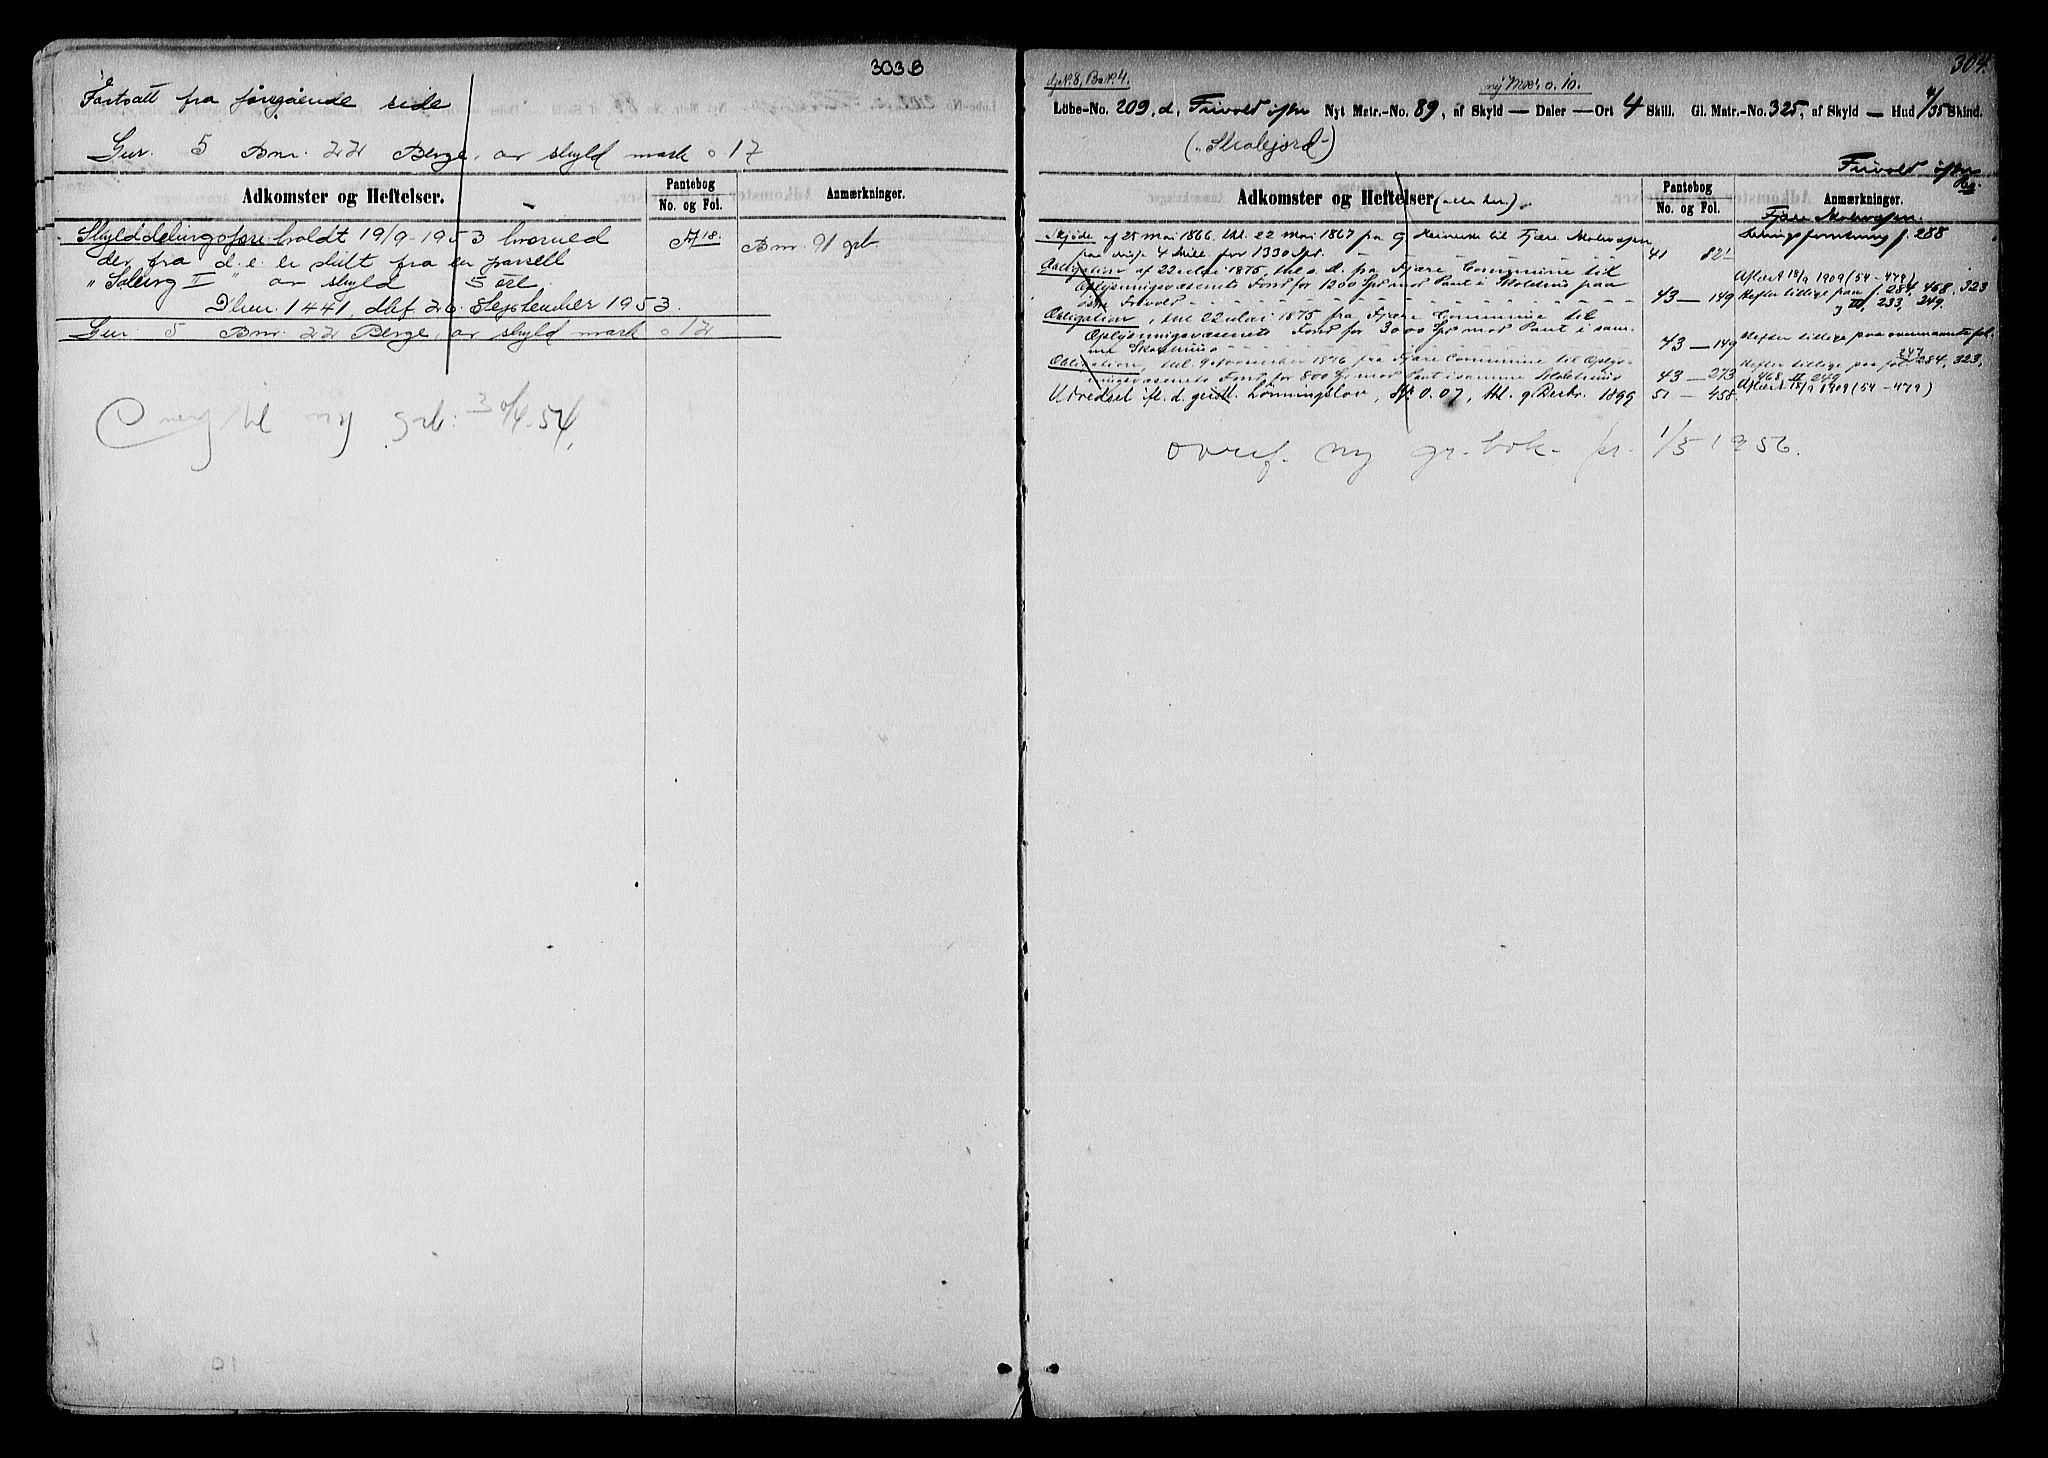 SAK, Vestre Nedenes/Sand sorenskriveri, G/Ga/L0016: Panteregister nr. 12b, 1770-1957, s. 304